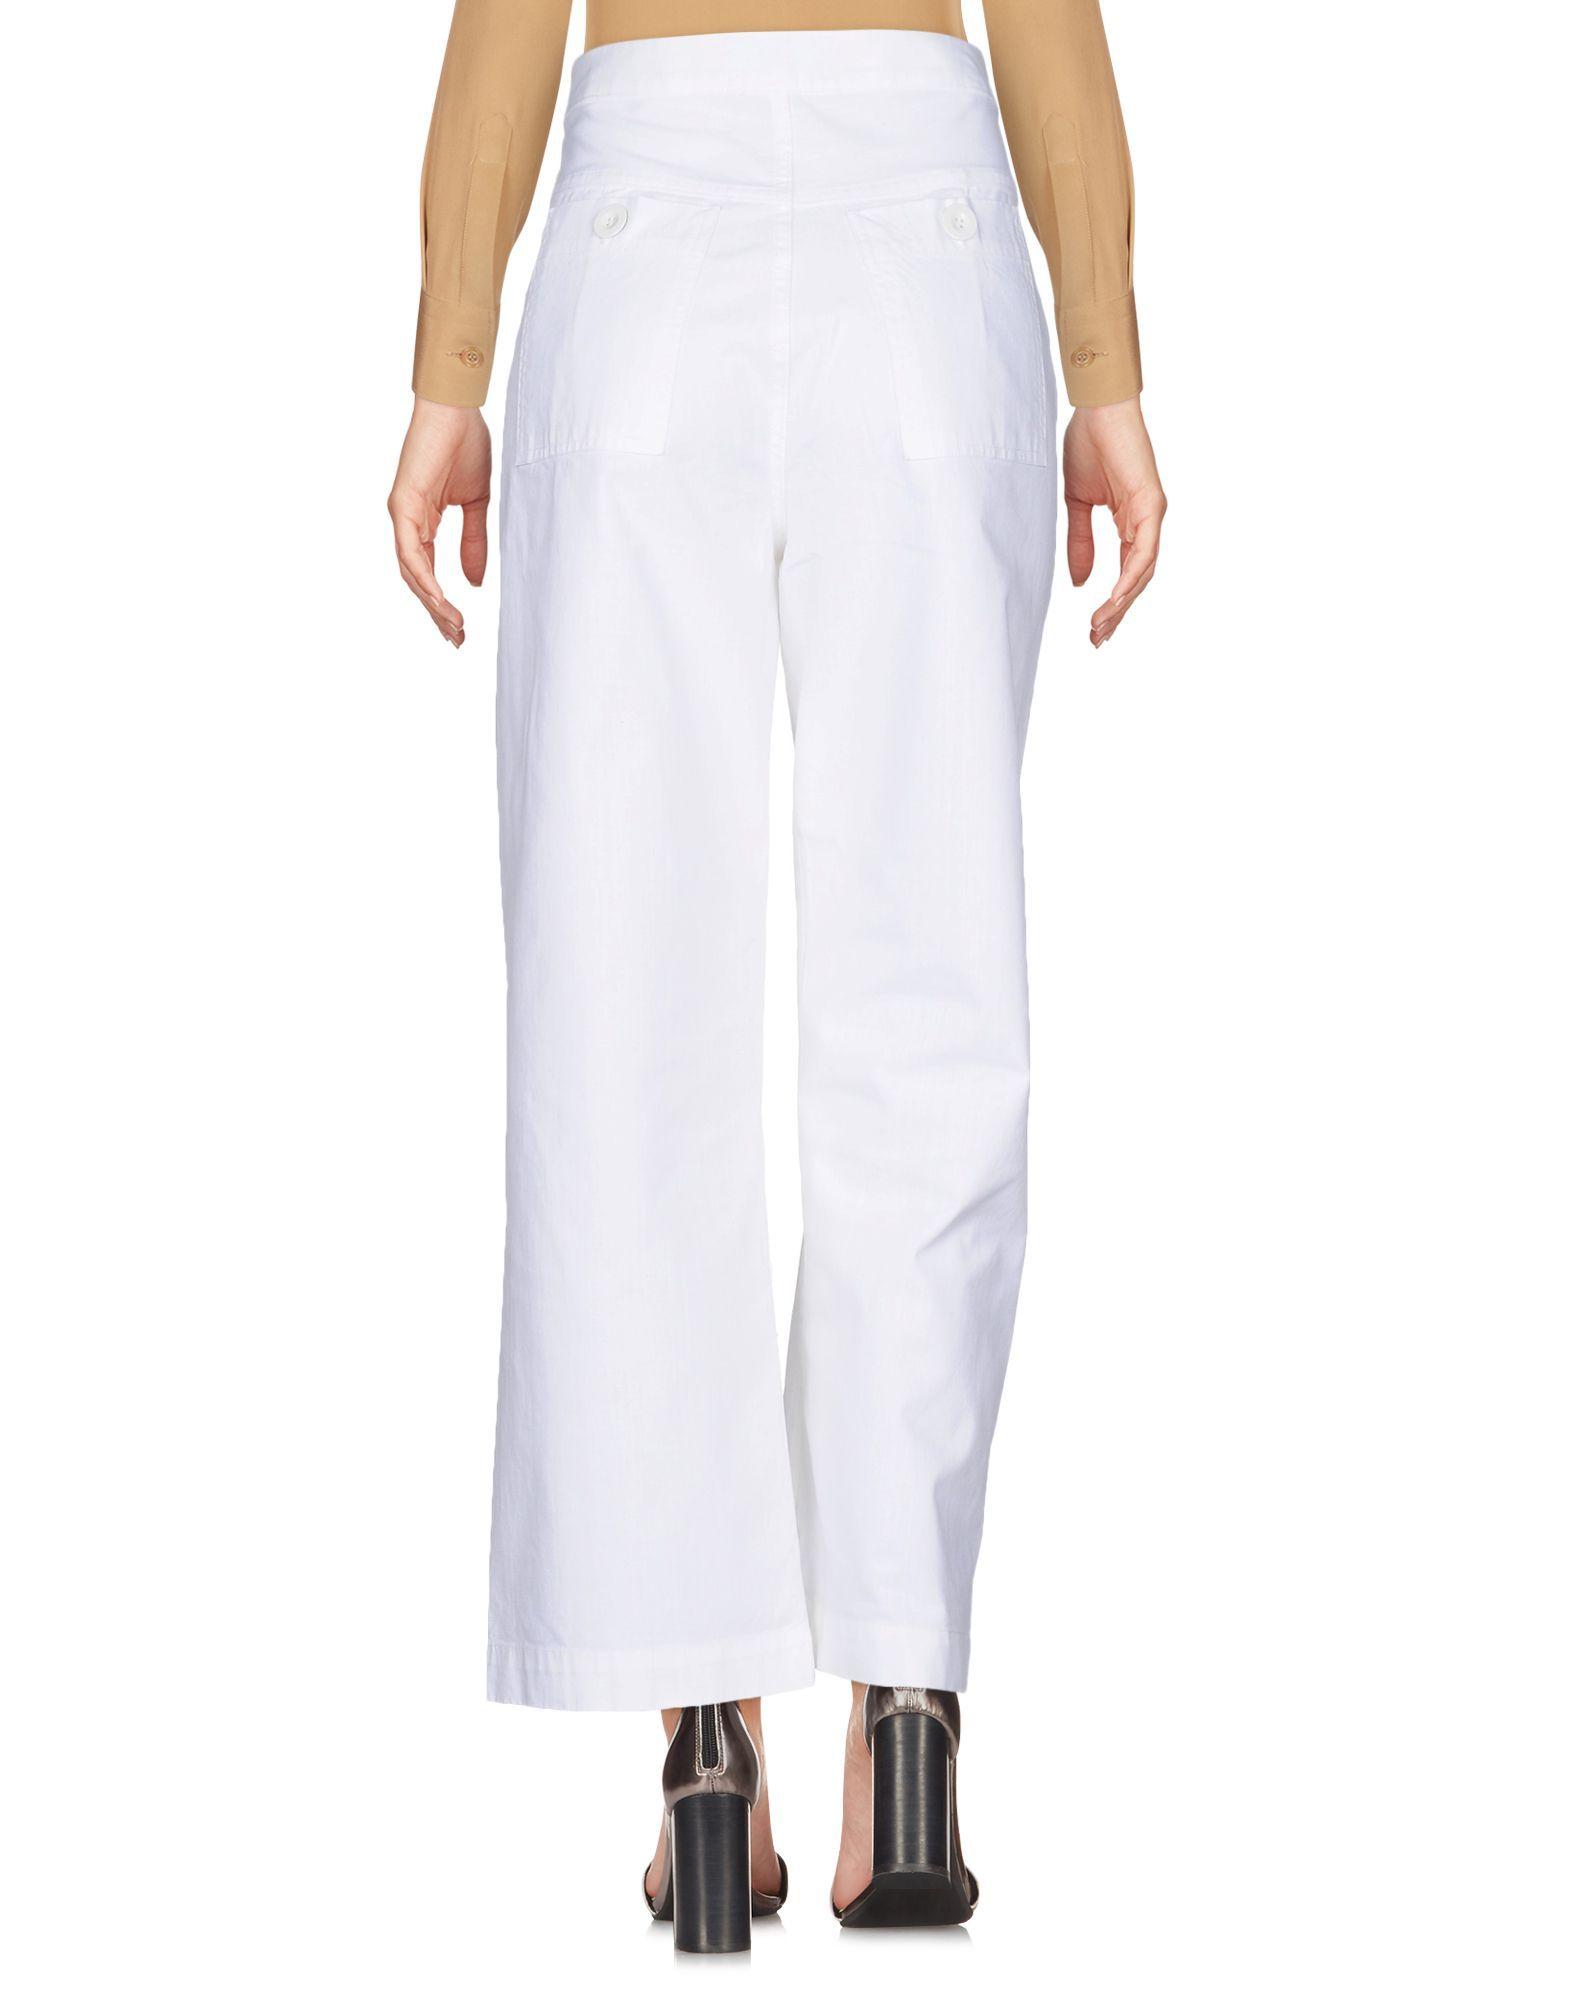 M.I.H Jeans White Cotton Wide Leg Trousers